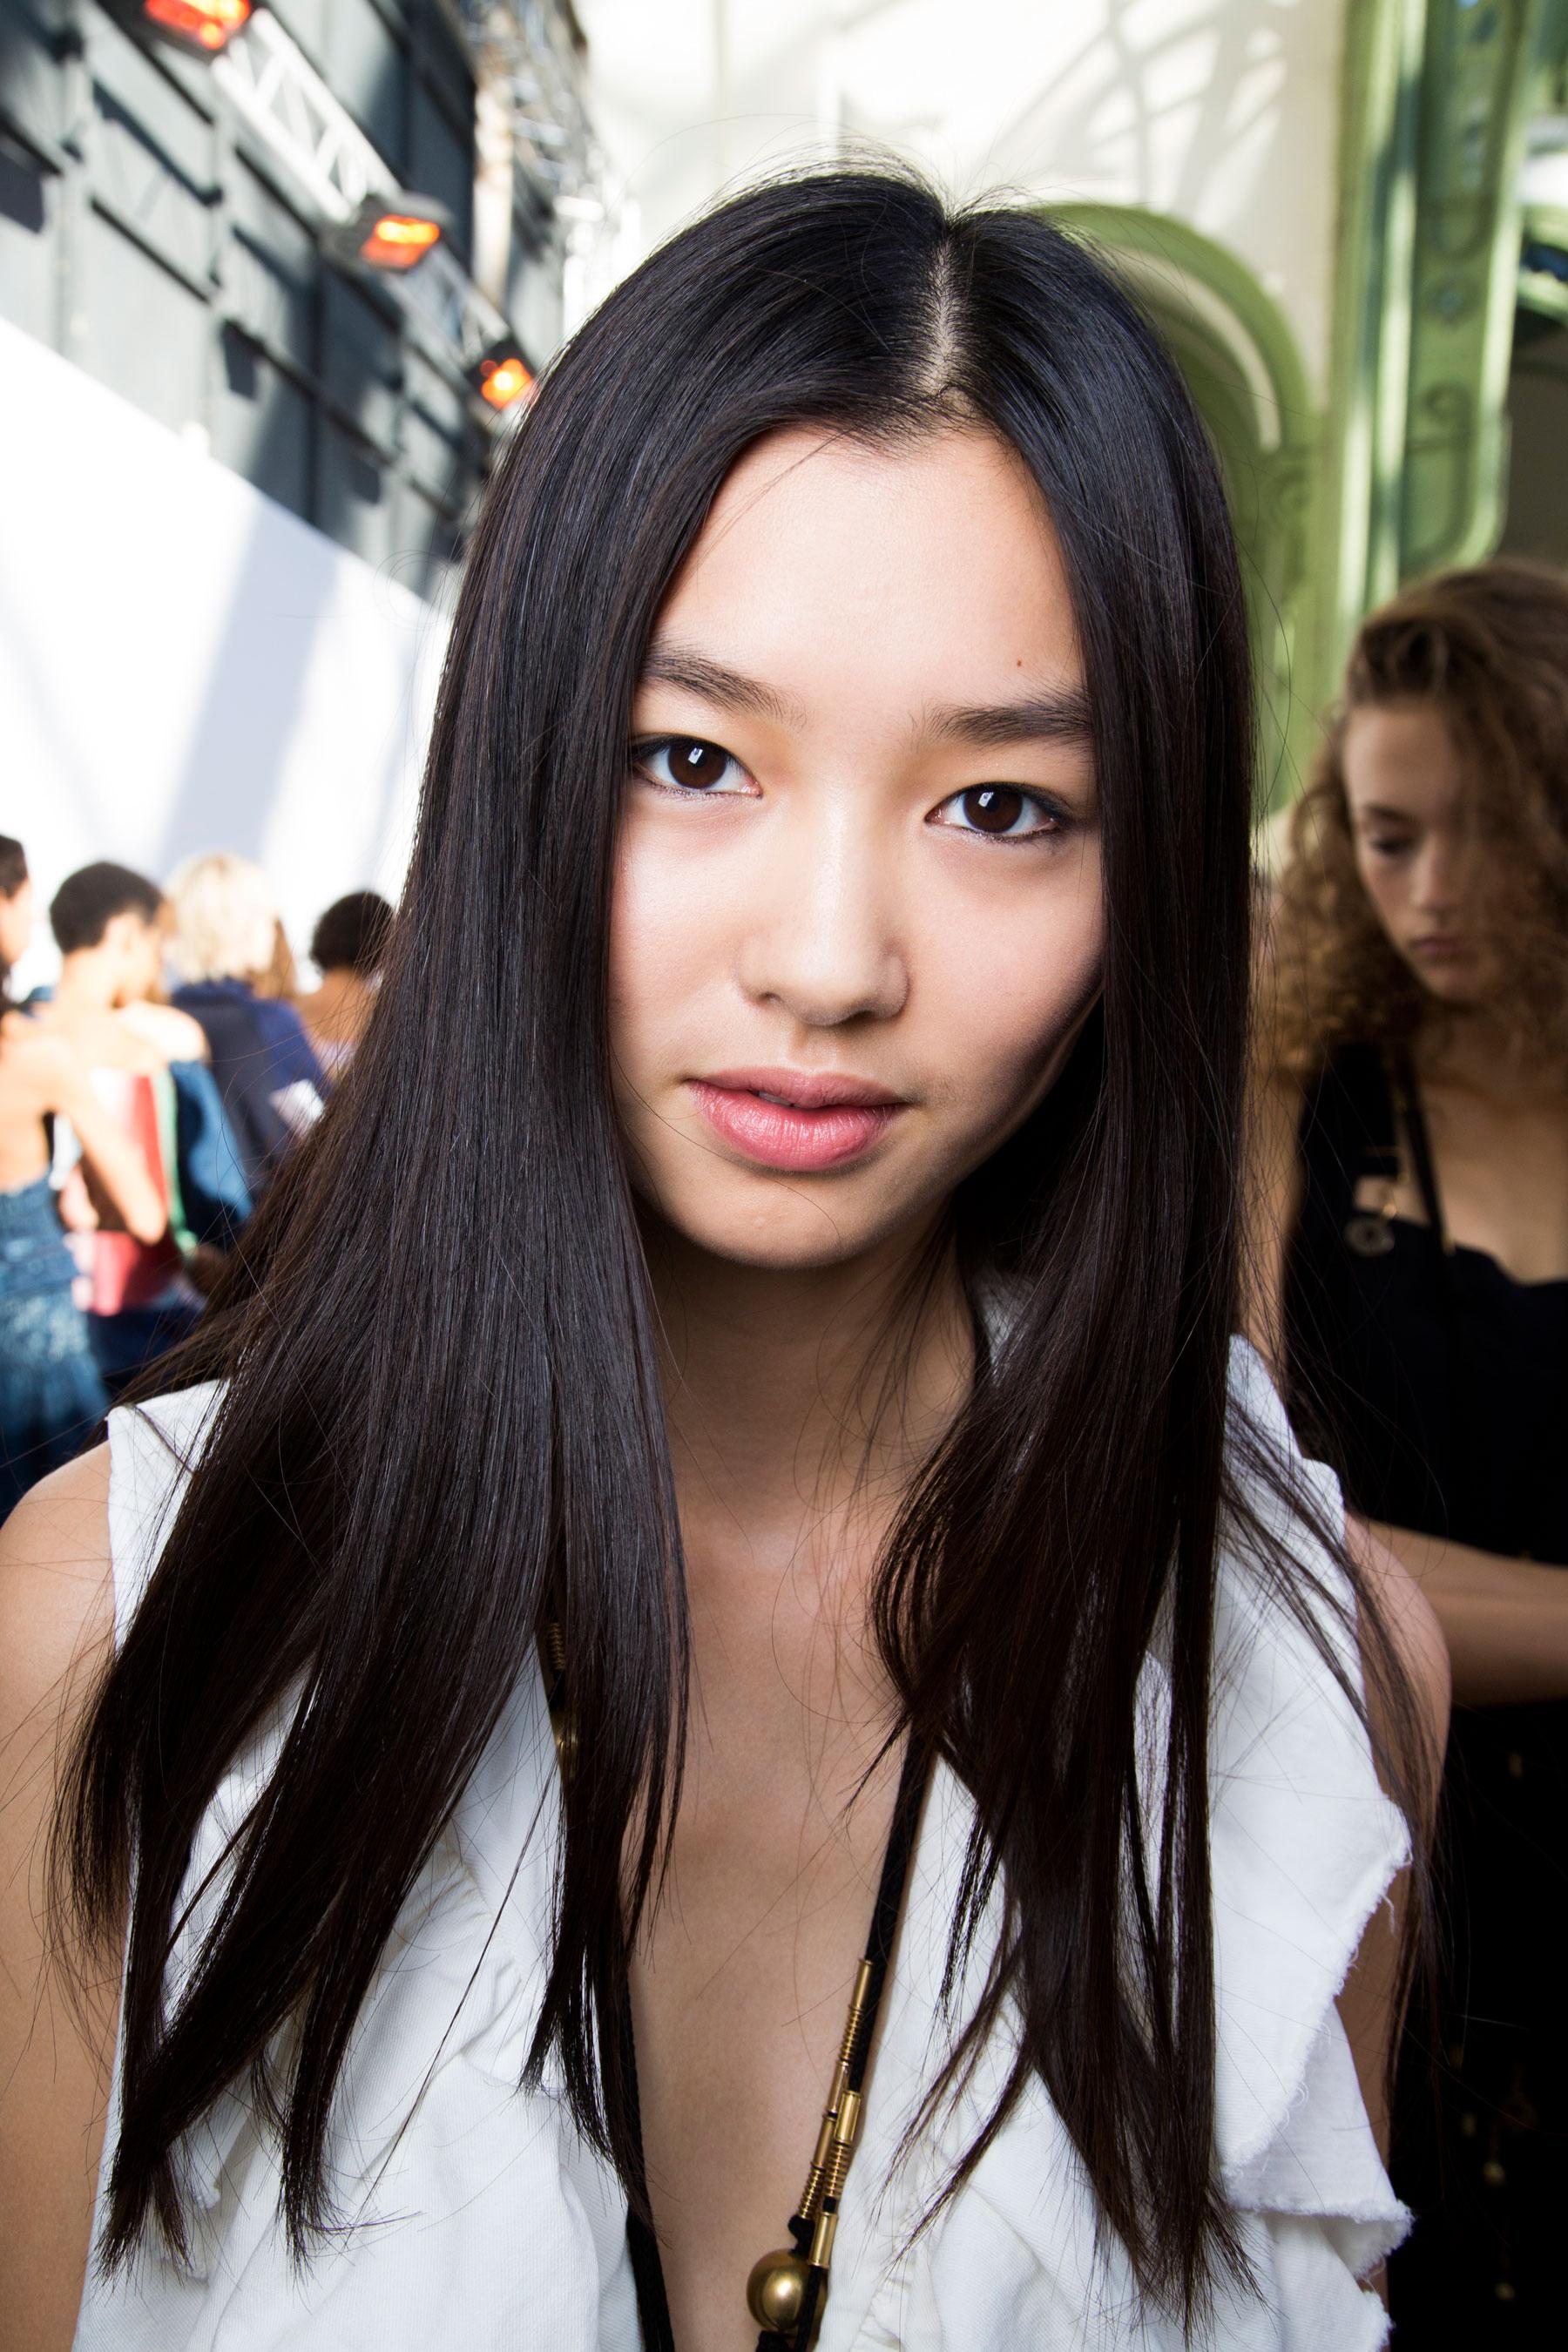 Chloe-spring-2016-beauty-fashion-show-the-impression-123